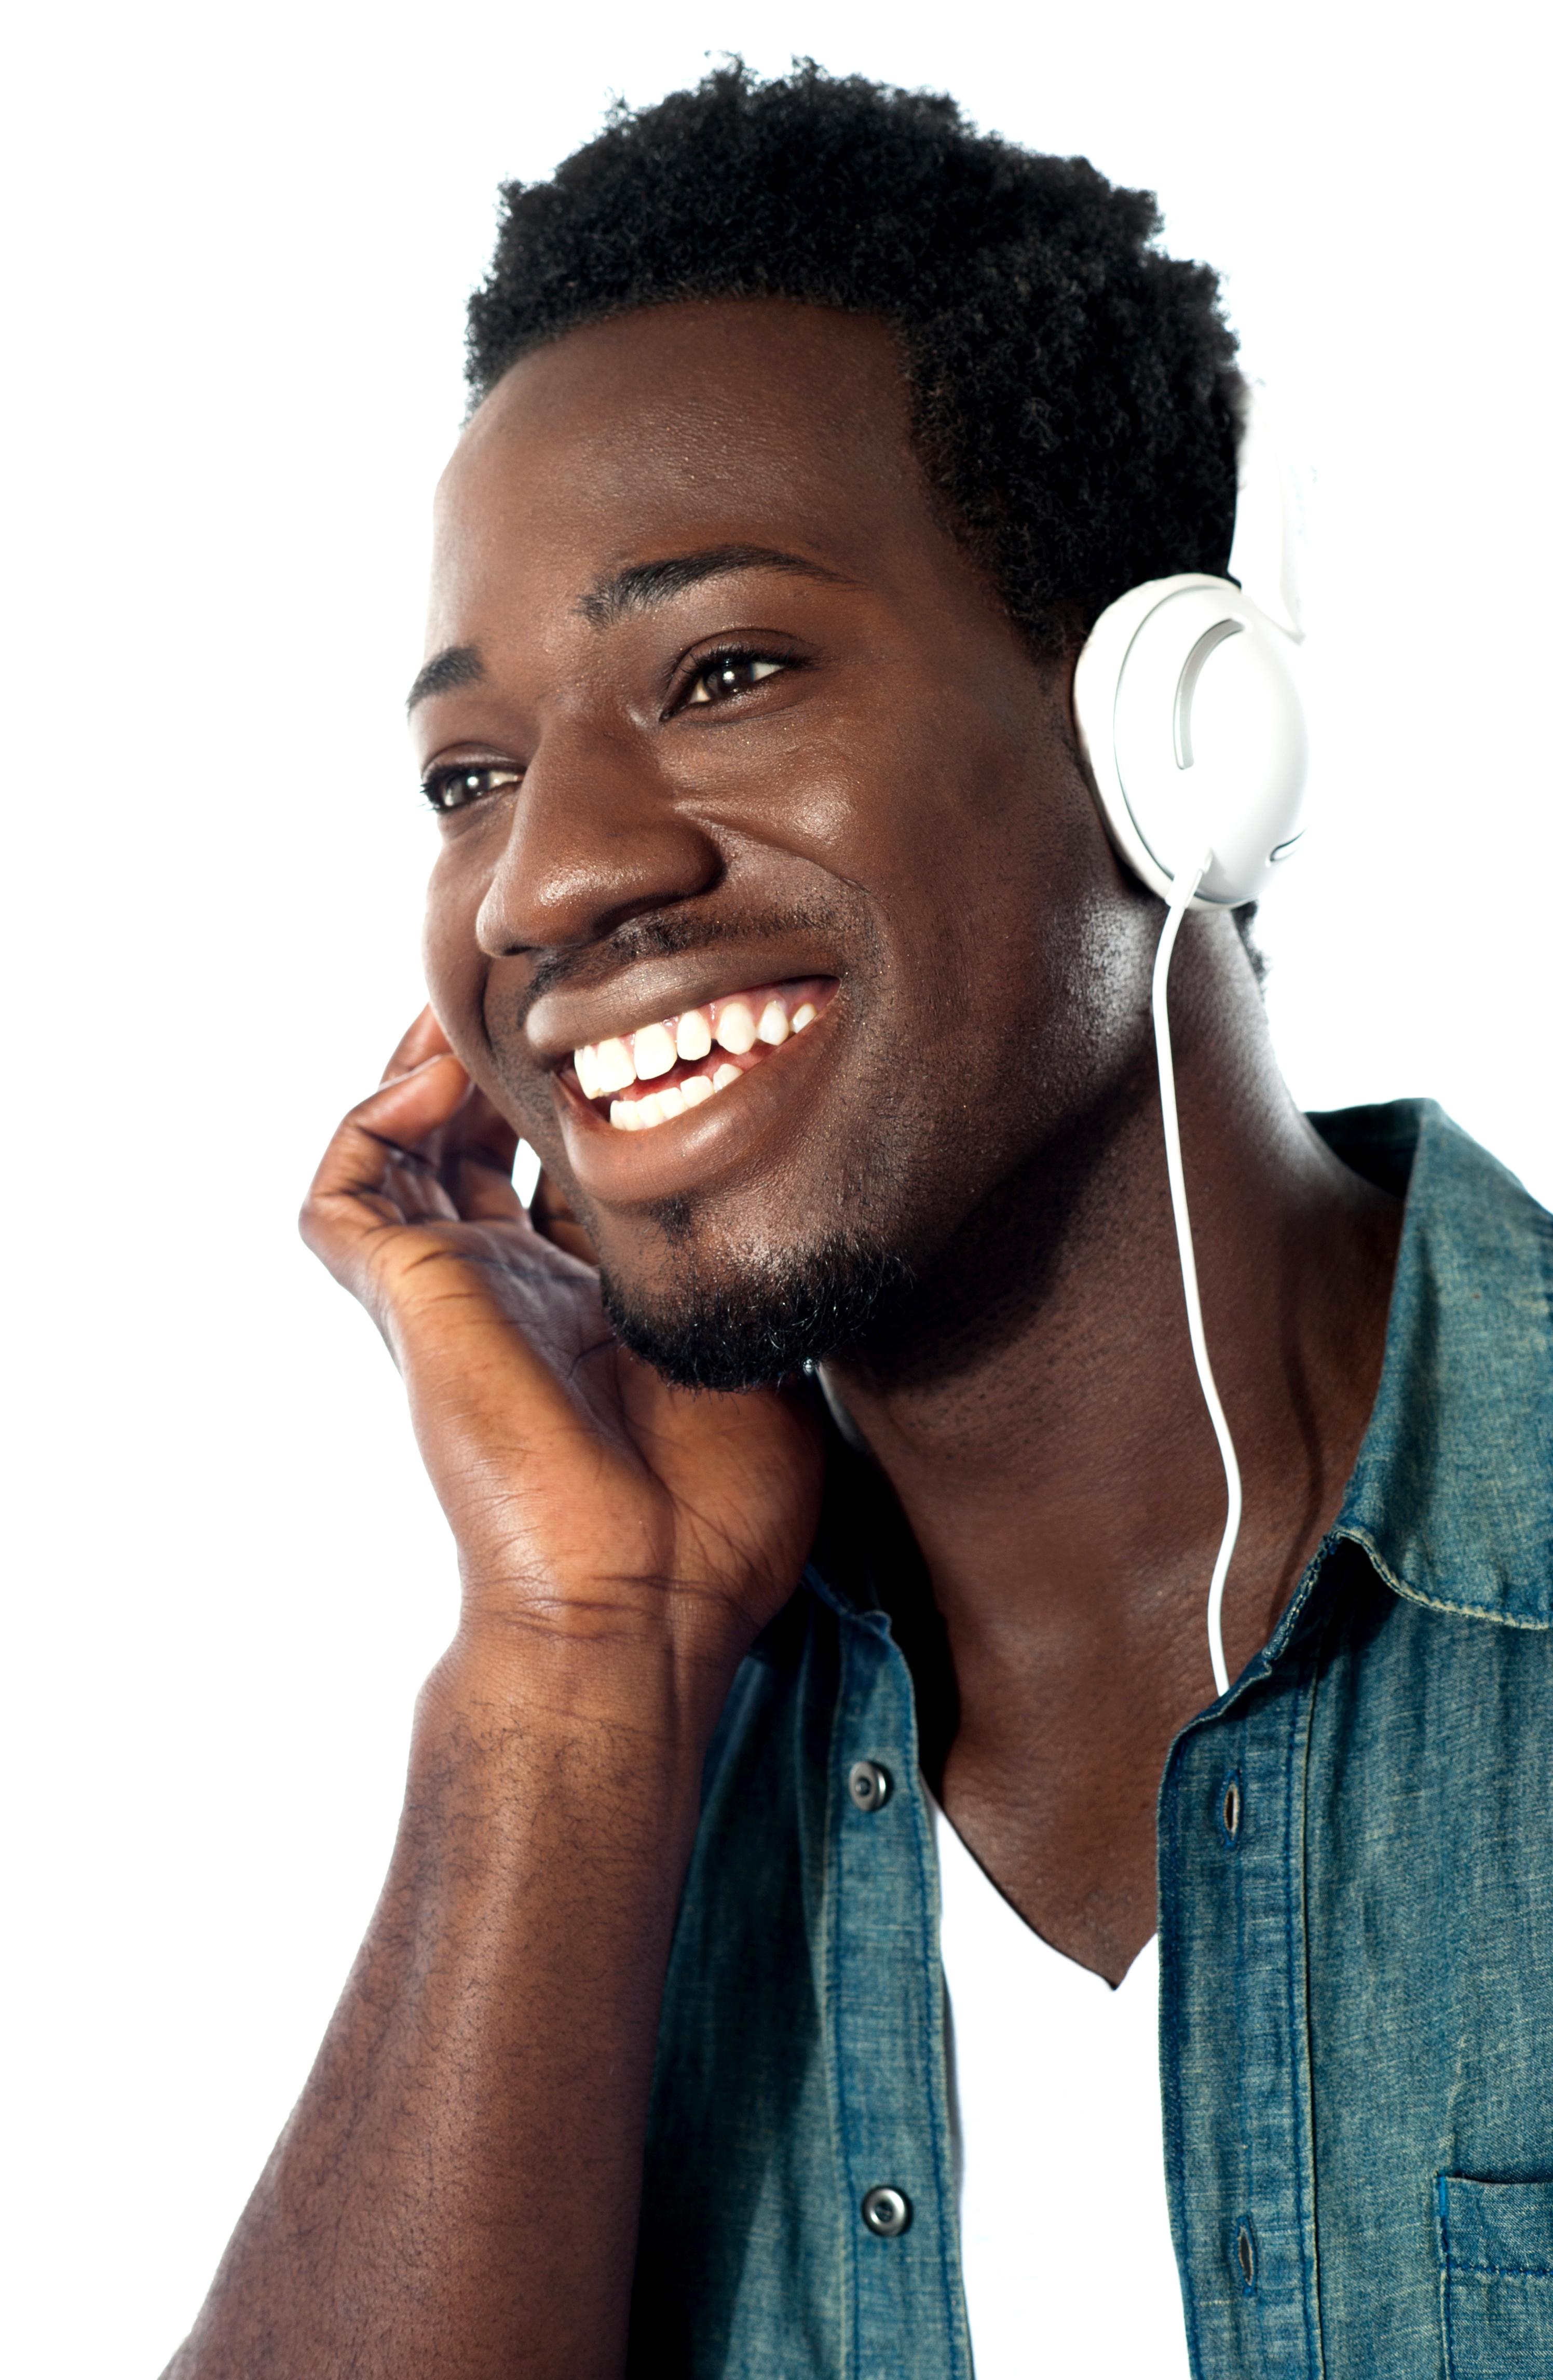 listening music png image purepng free transparent cc0 png image